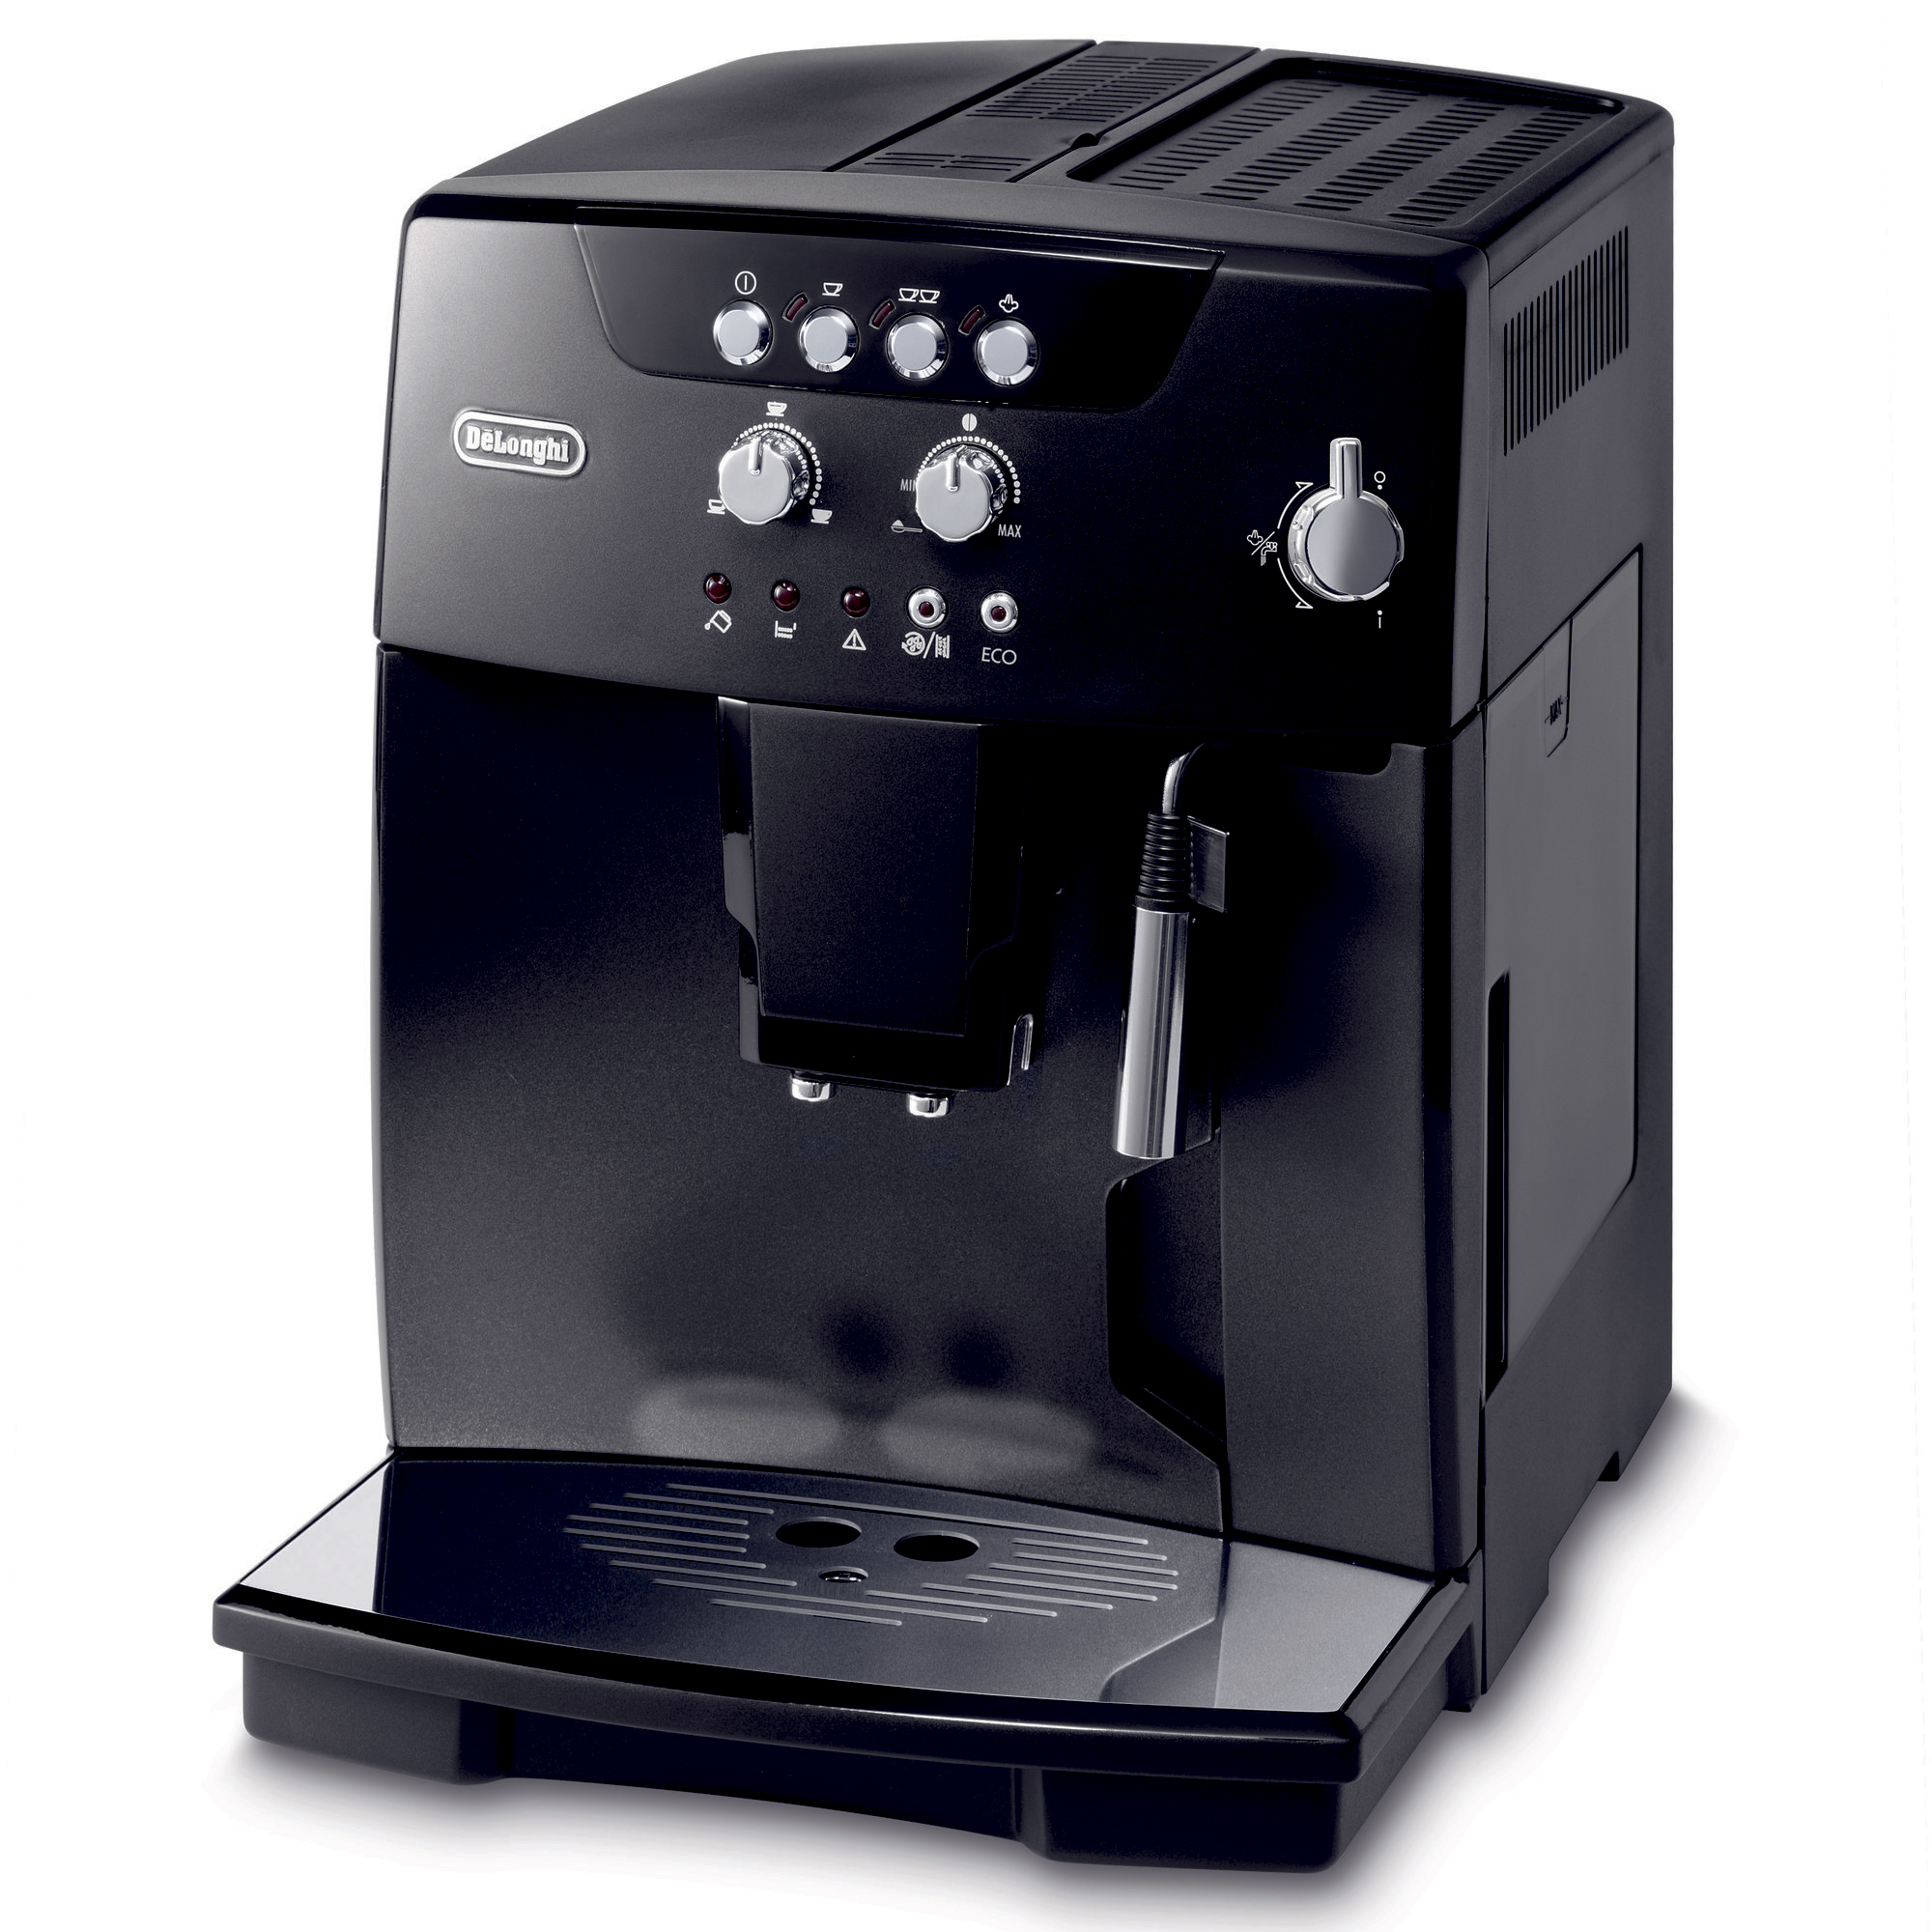 DeLonghi espressomaskine - ESAM 04.110.B